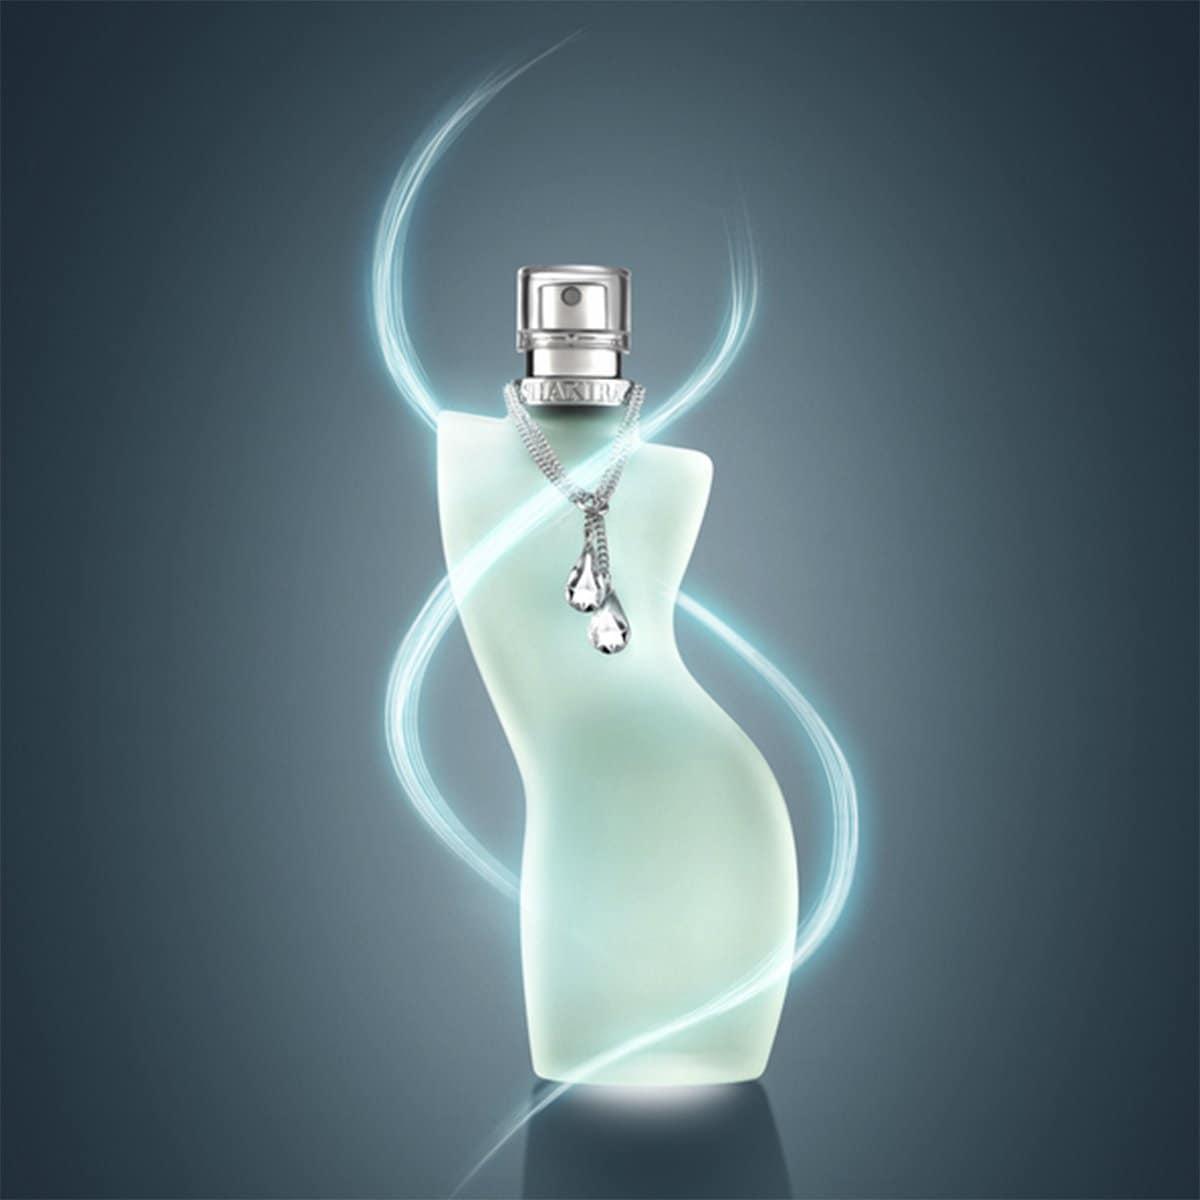 Estuche para Dama Shakira Dance Diamonds Edt 80Ml + Desodorante 150Ml